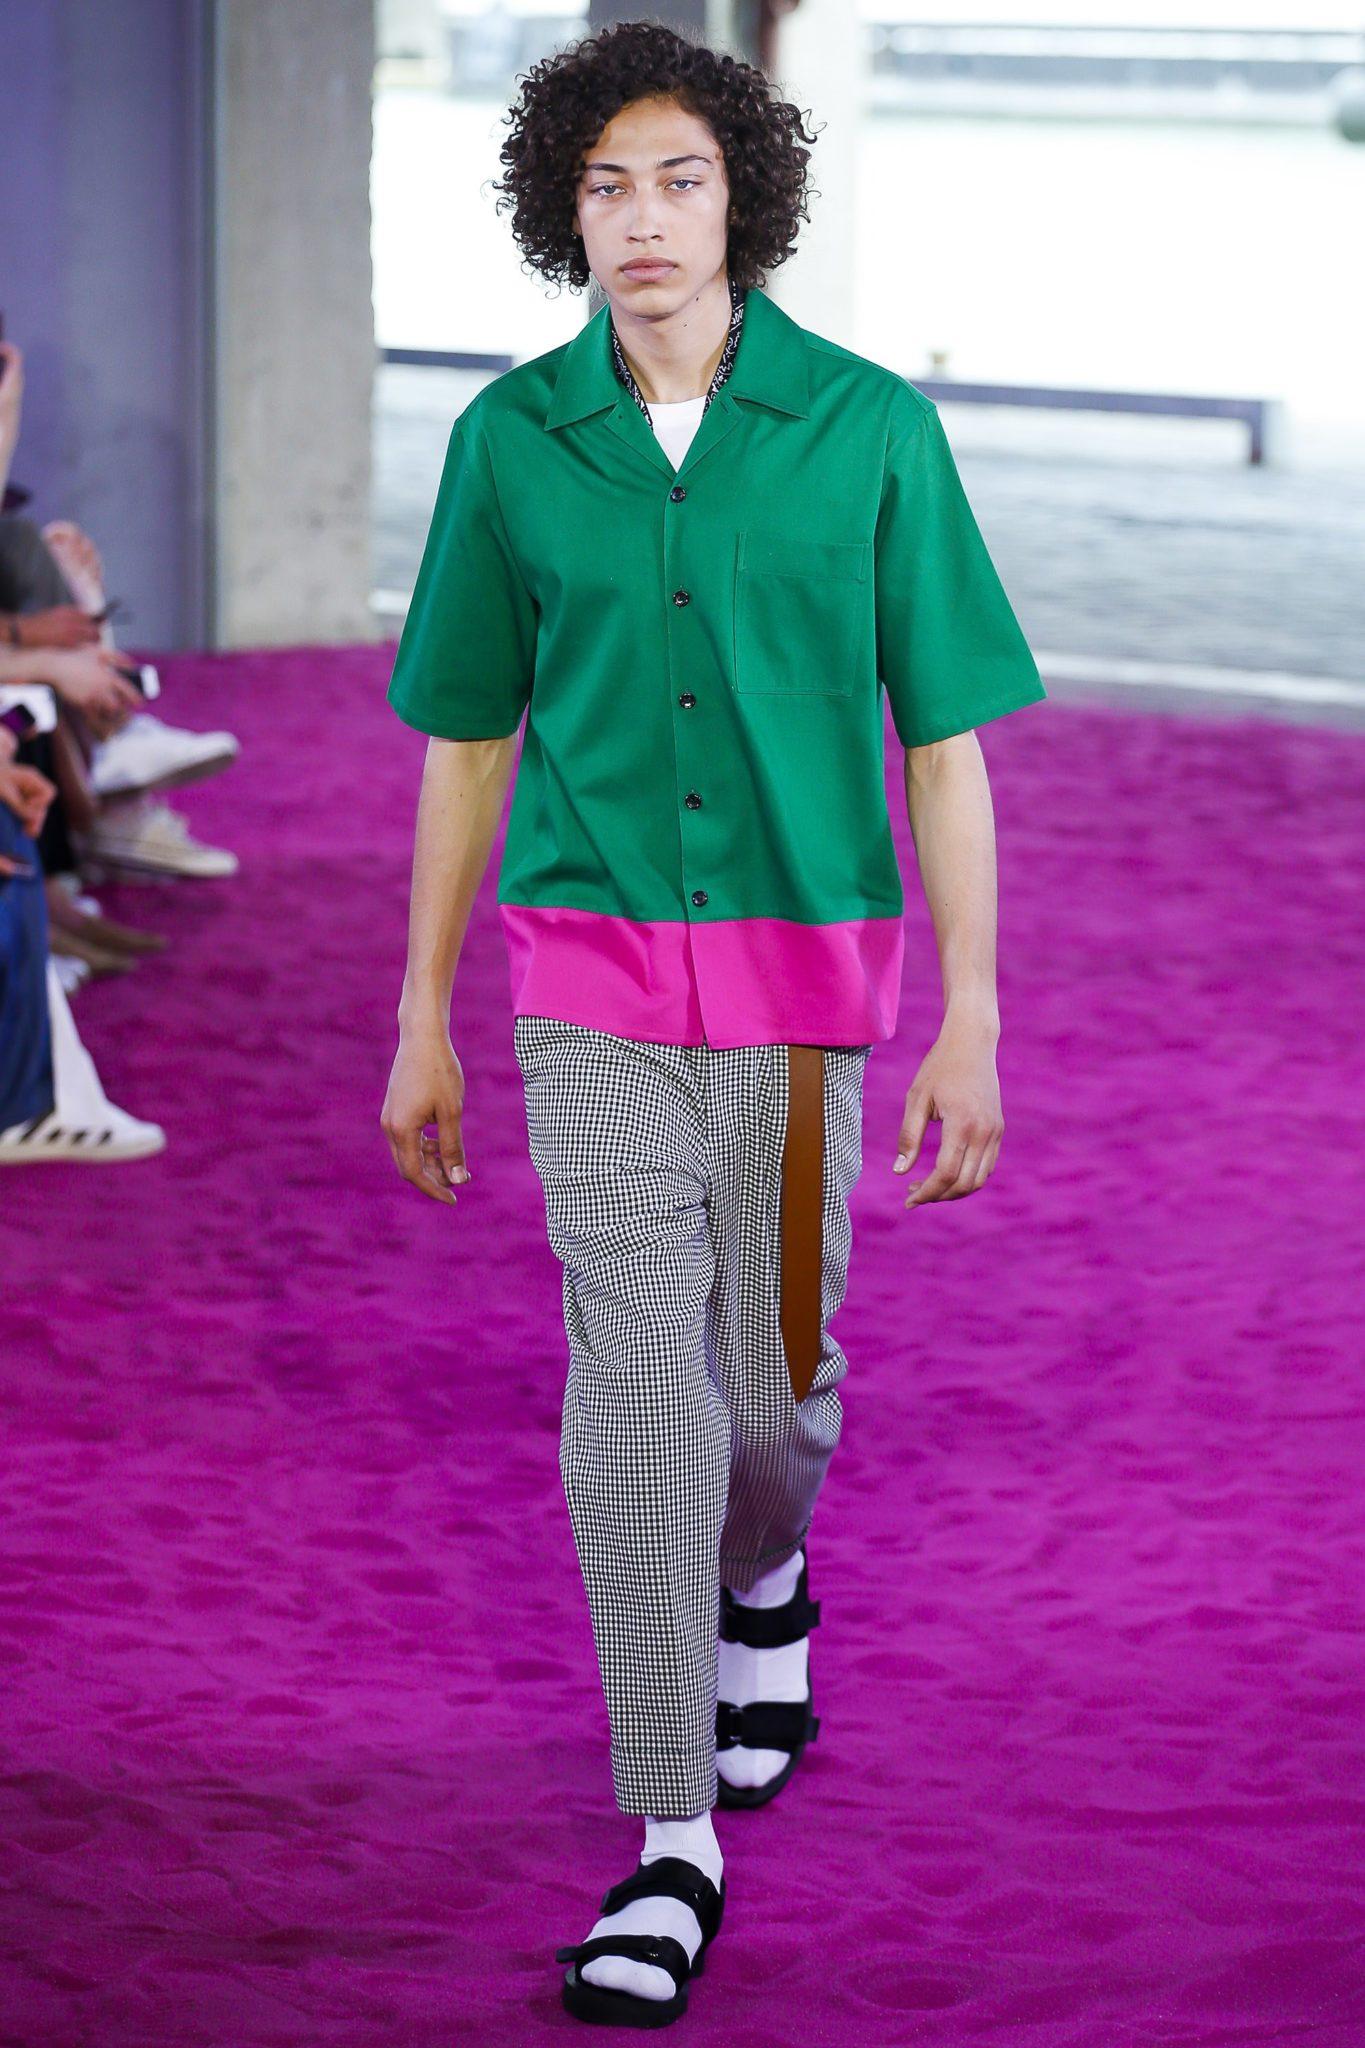 65859865c67 tendance-claquettes-chaussettes-maurice-style-blog-mode-homme-avis-5 ...